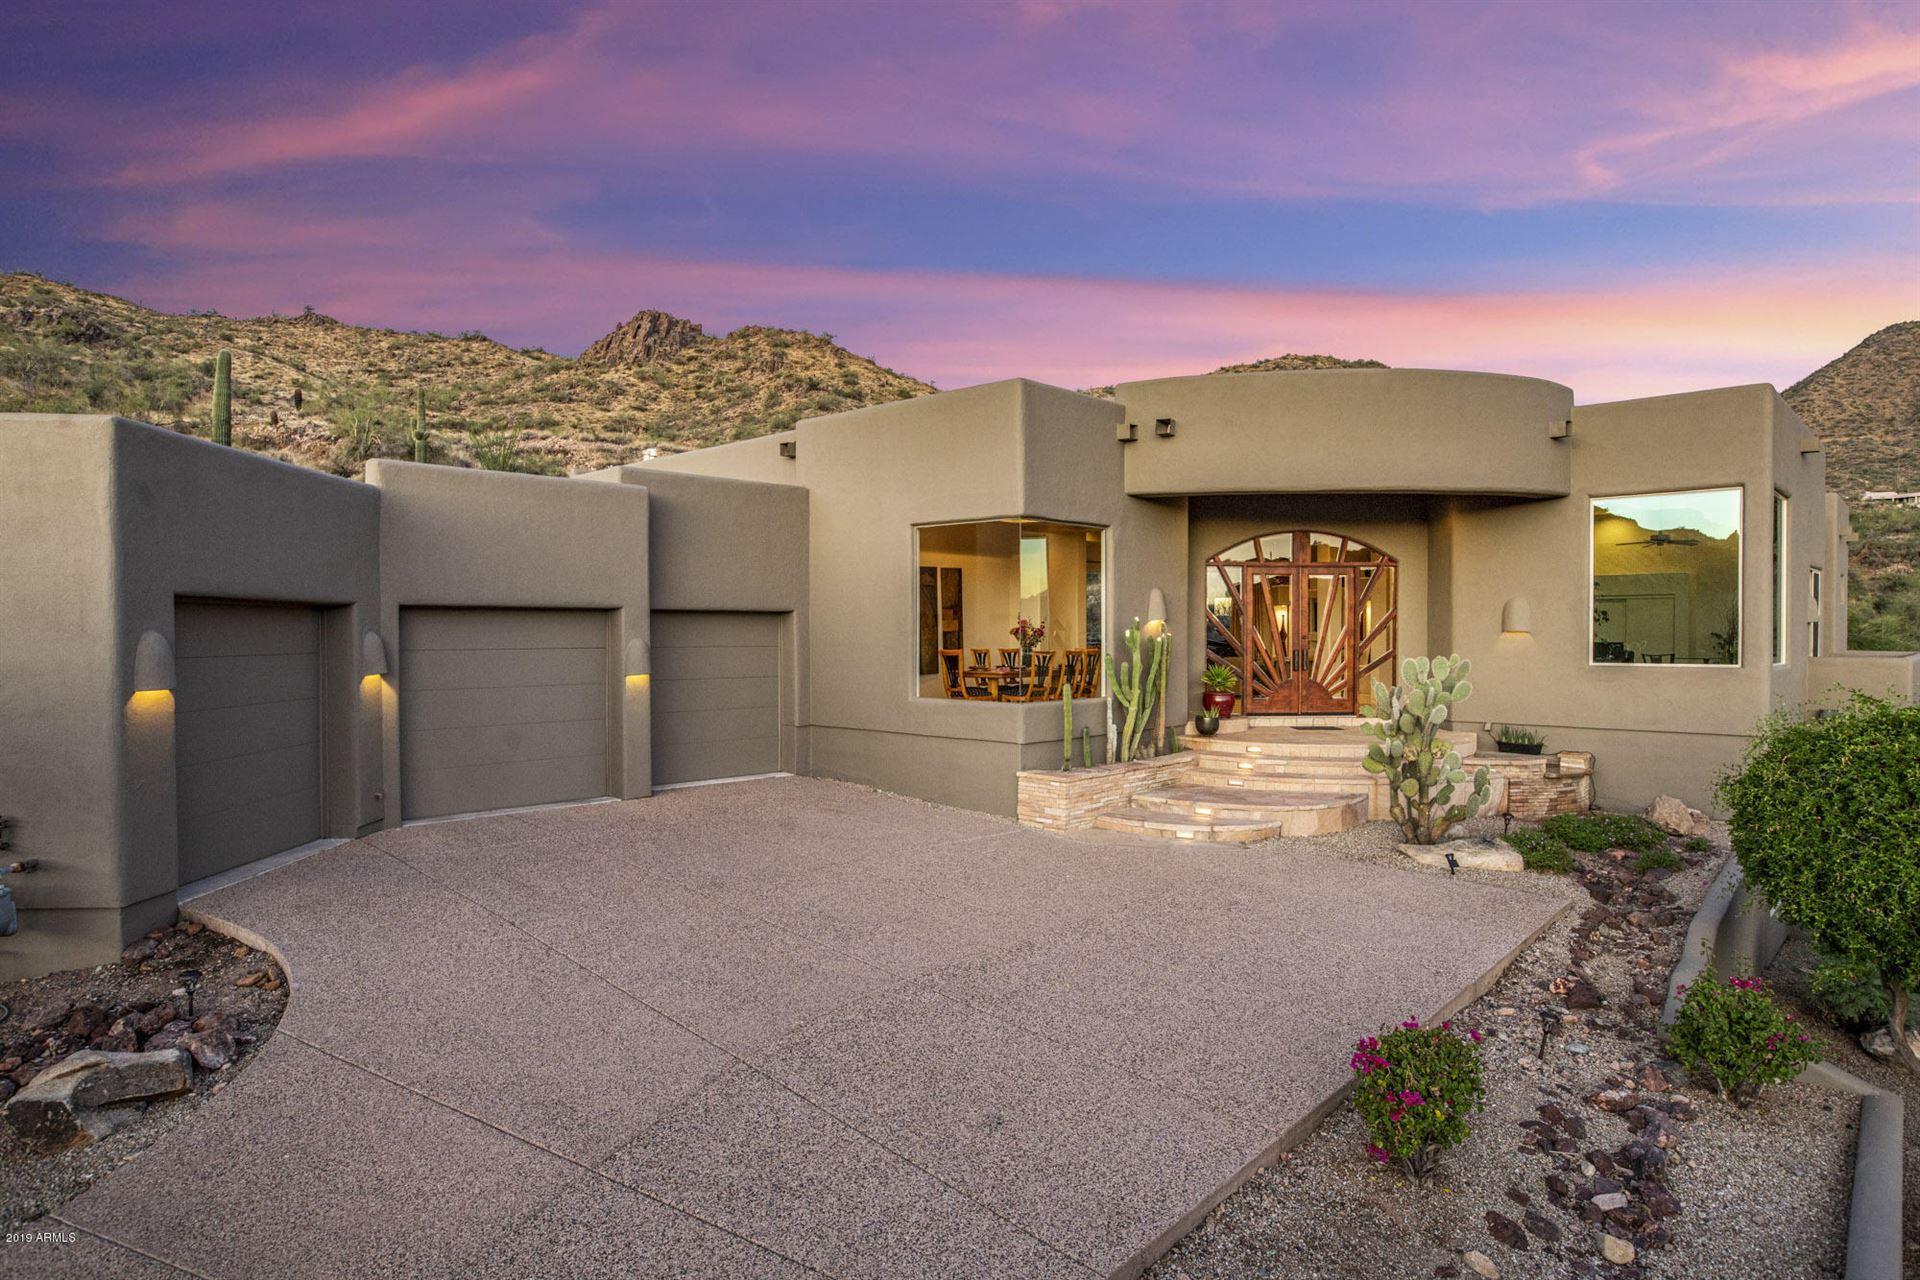 14641 E SHADOW CANYON Drive, Fountain Hills, AZ 85268 - MLS#: 5986152